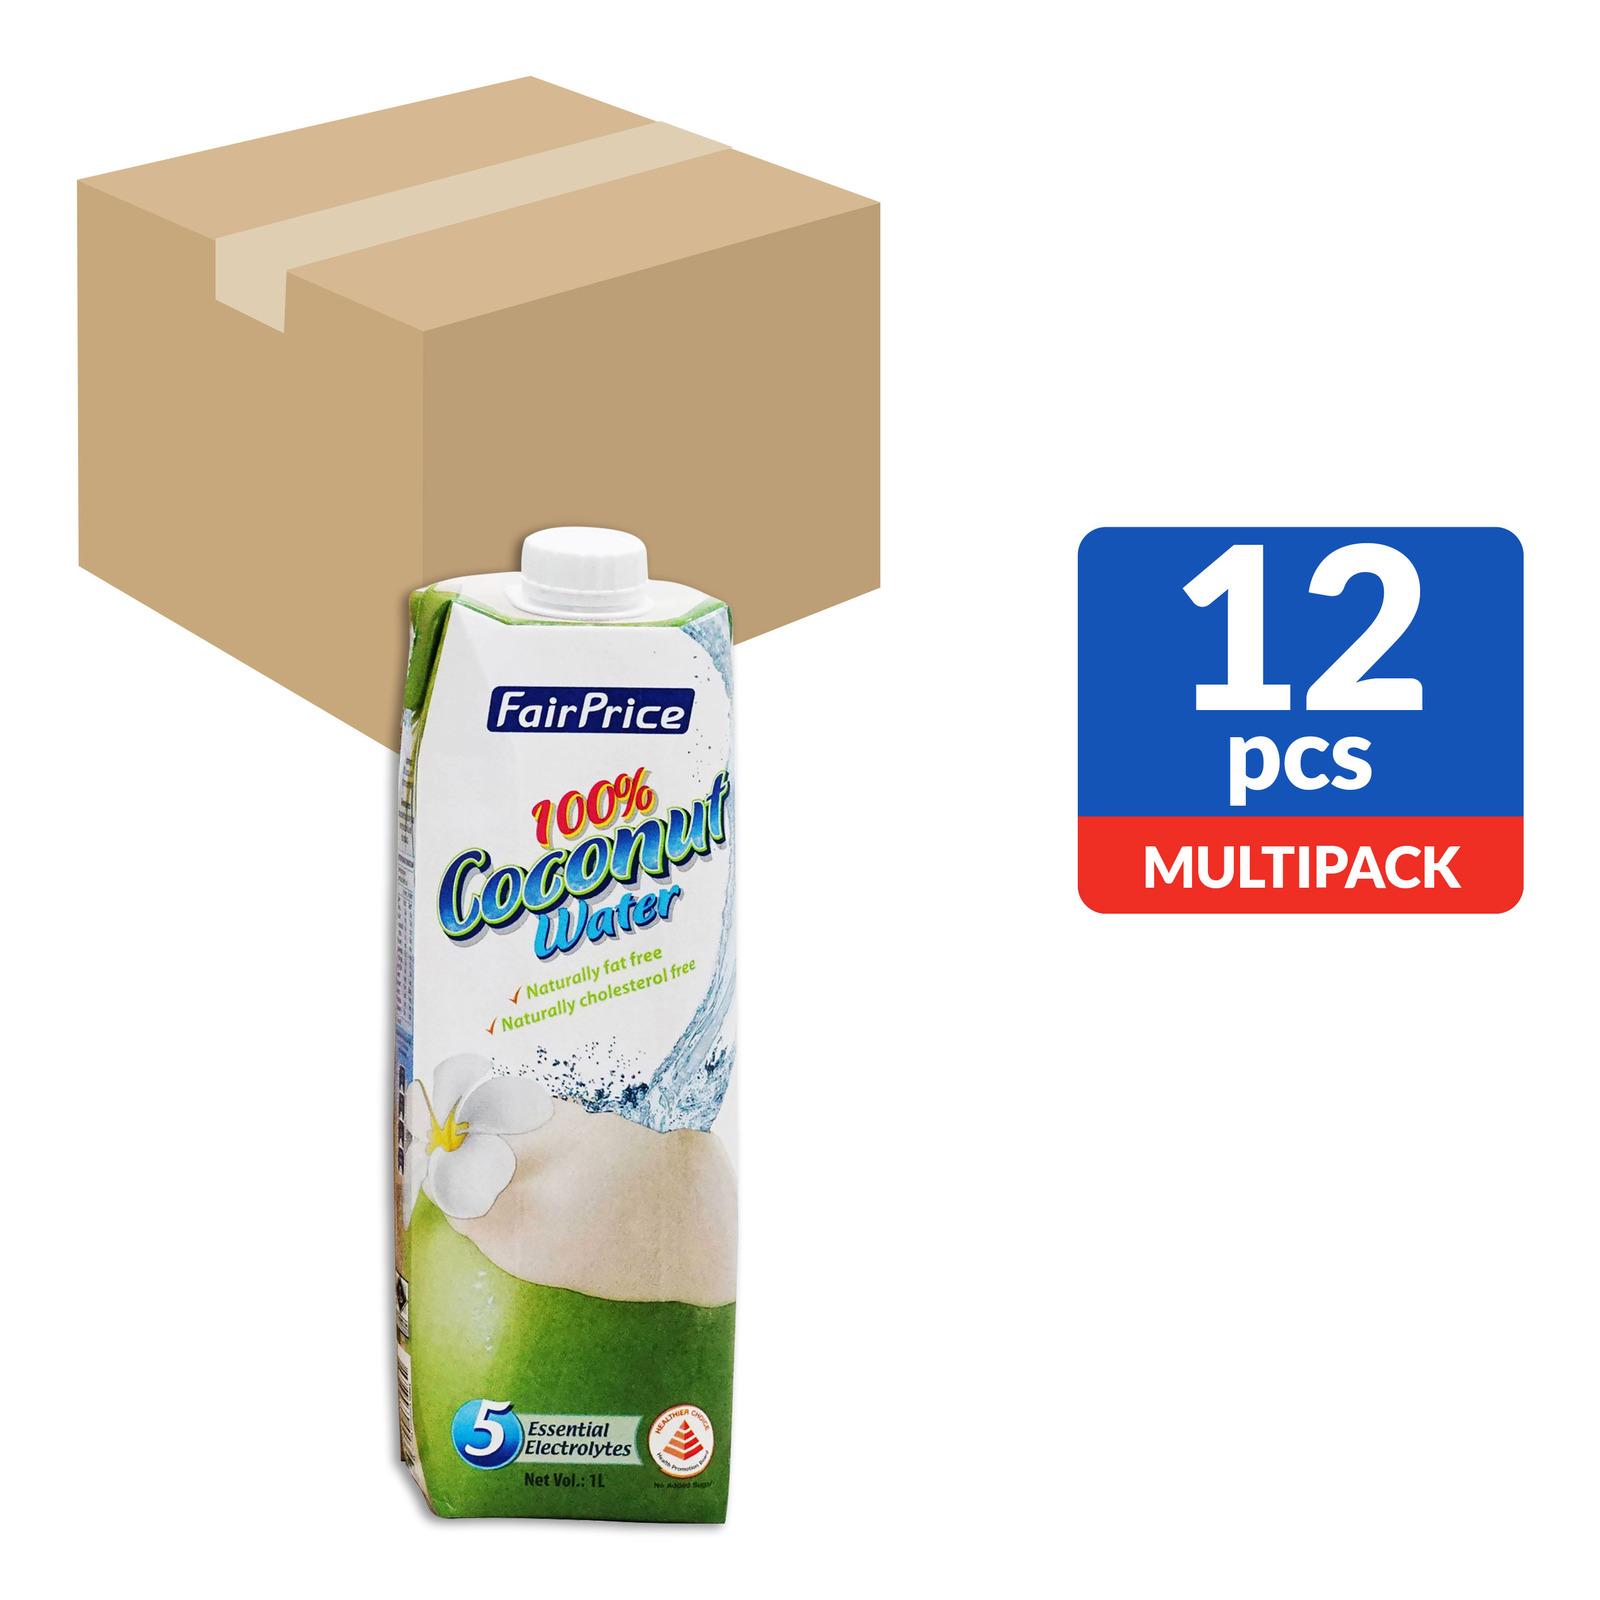 FairPrice 100% Coconut Water